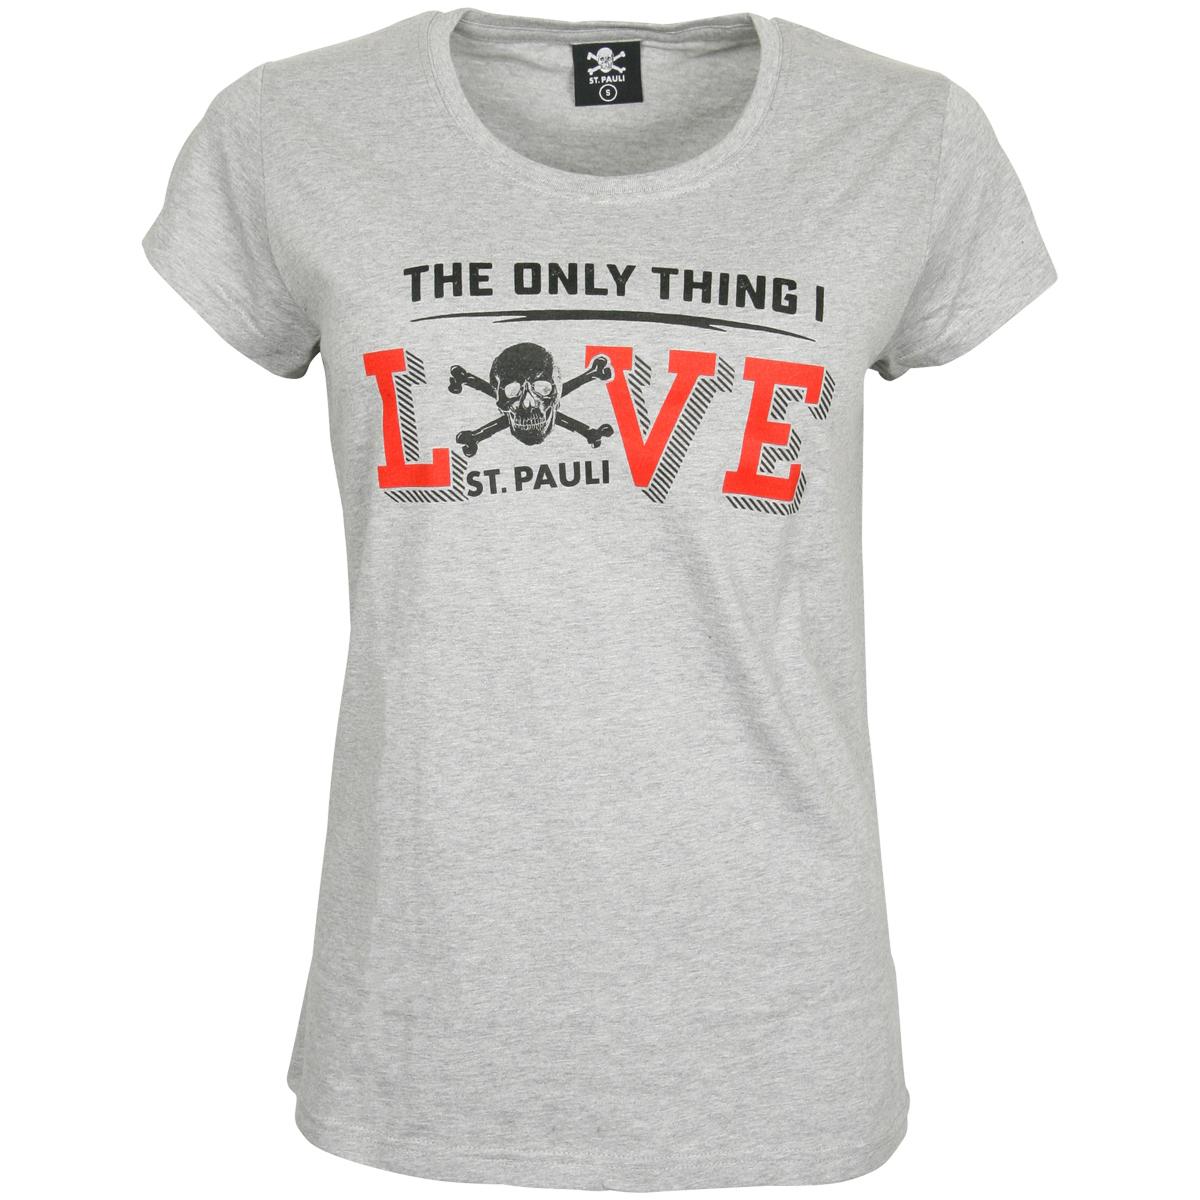 FC St. Pauli - Damen T-Shirt Love - grau